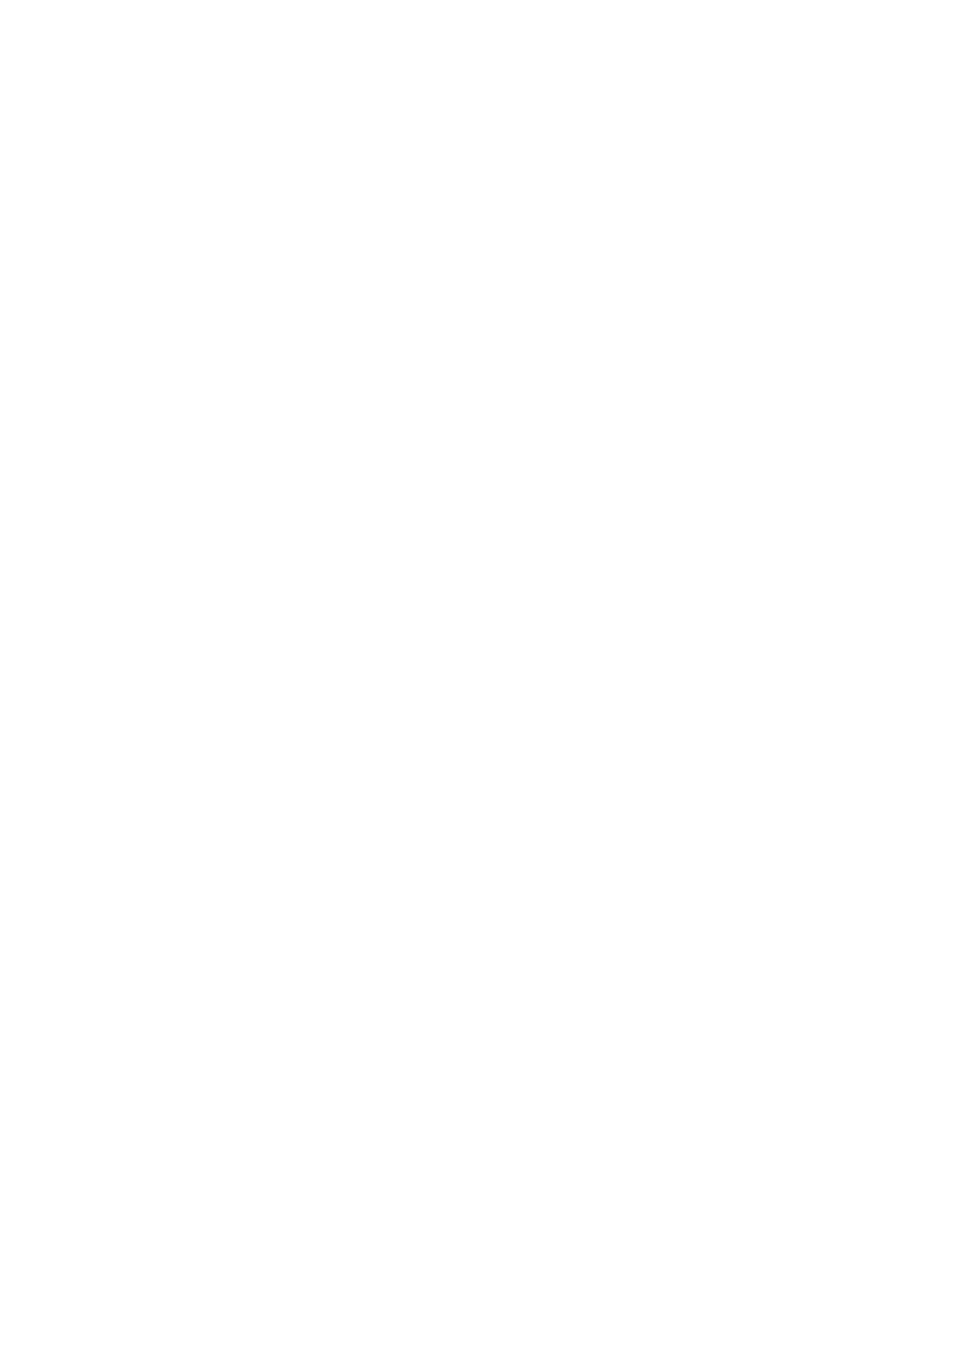 2 zero throttle map | Haltech F9A User Manual | Page 50 / 99